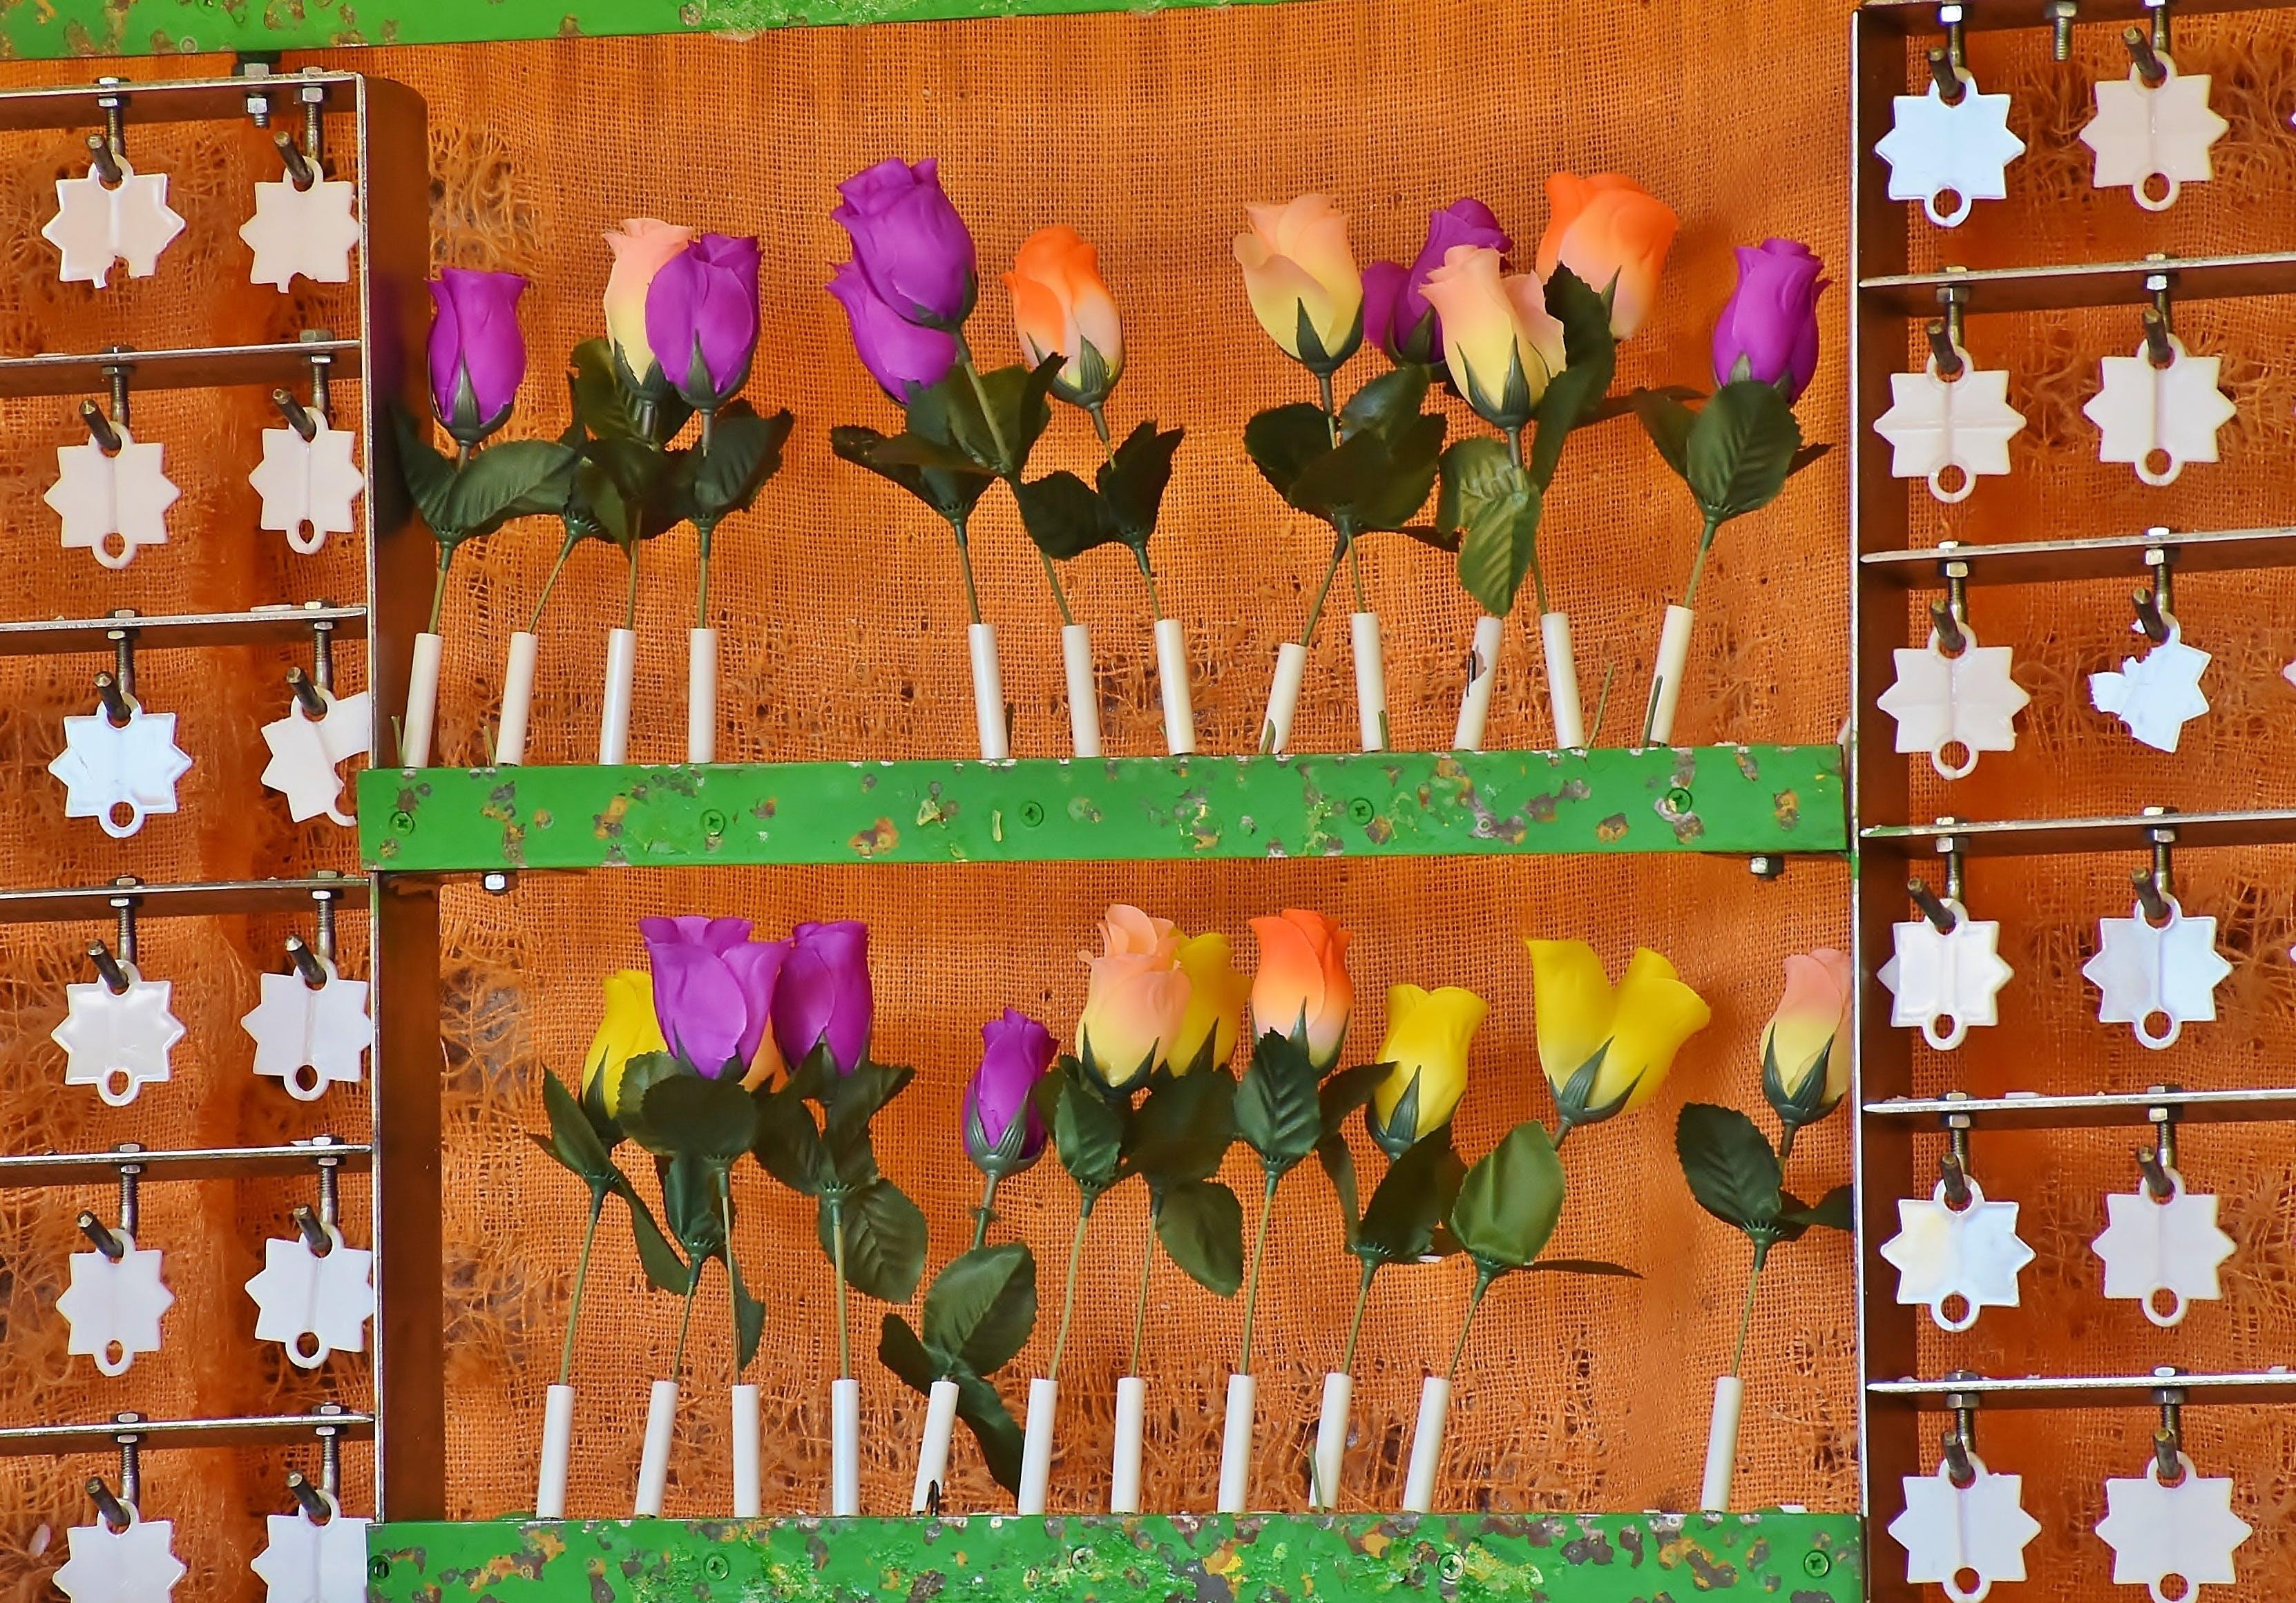 Free stock photo of roses, fair, win, shoot